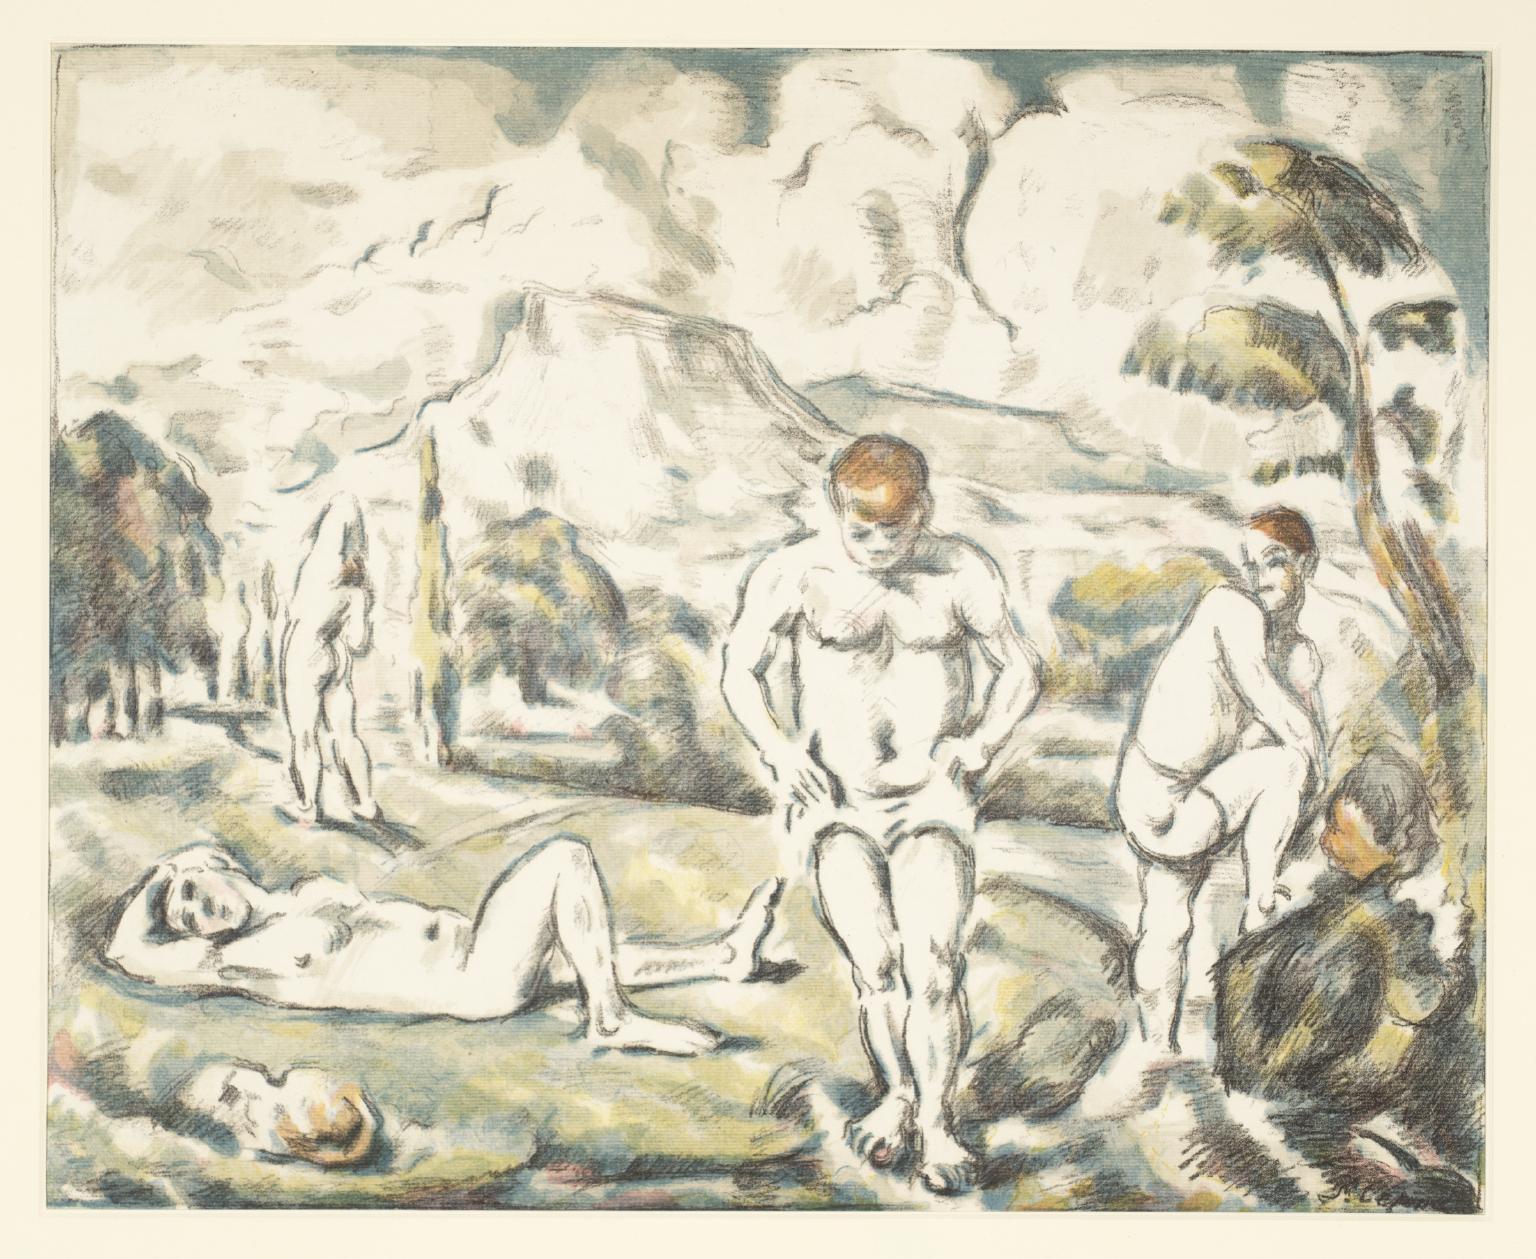 1536x1259 The Large Bathers', Paul C.1898 Tate